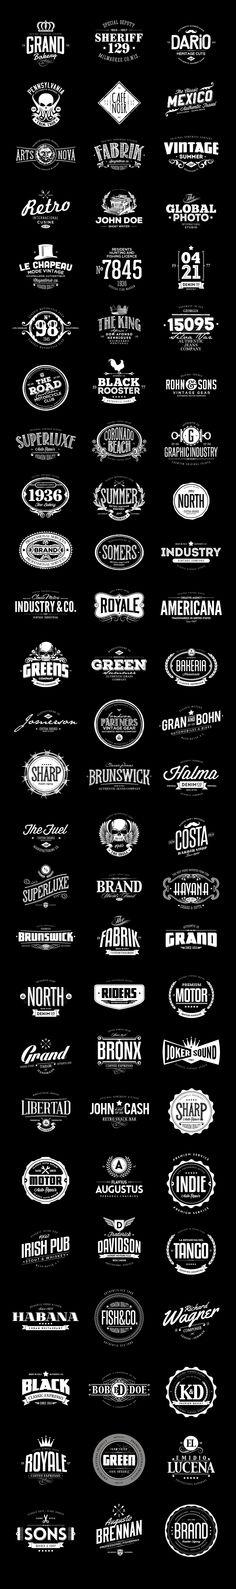 78 Badges & Logos Bundle on Behance